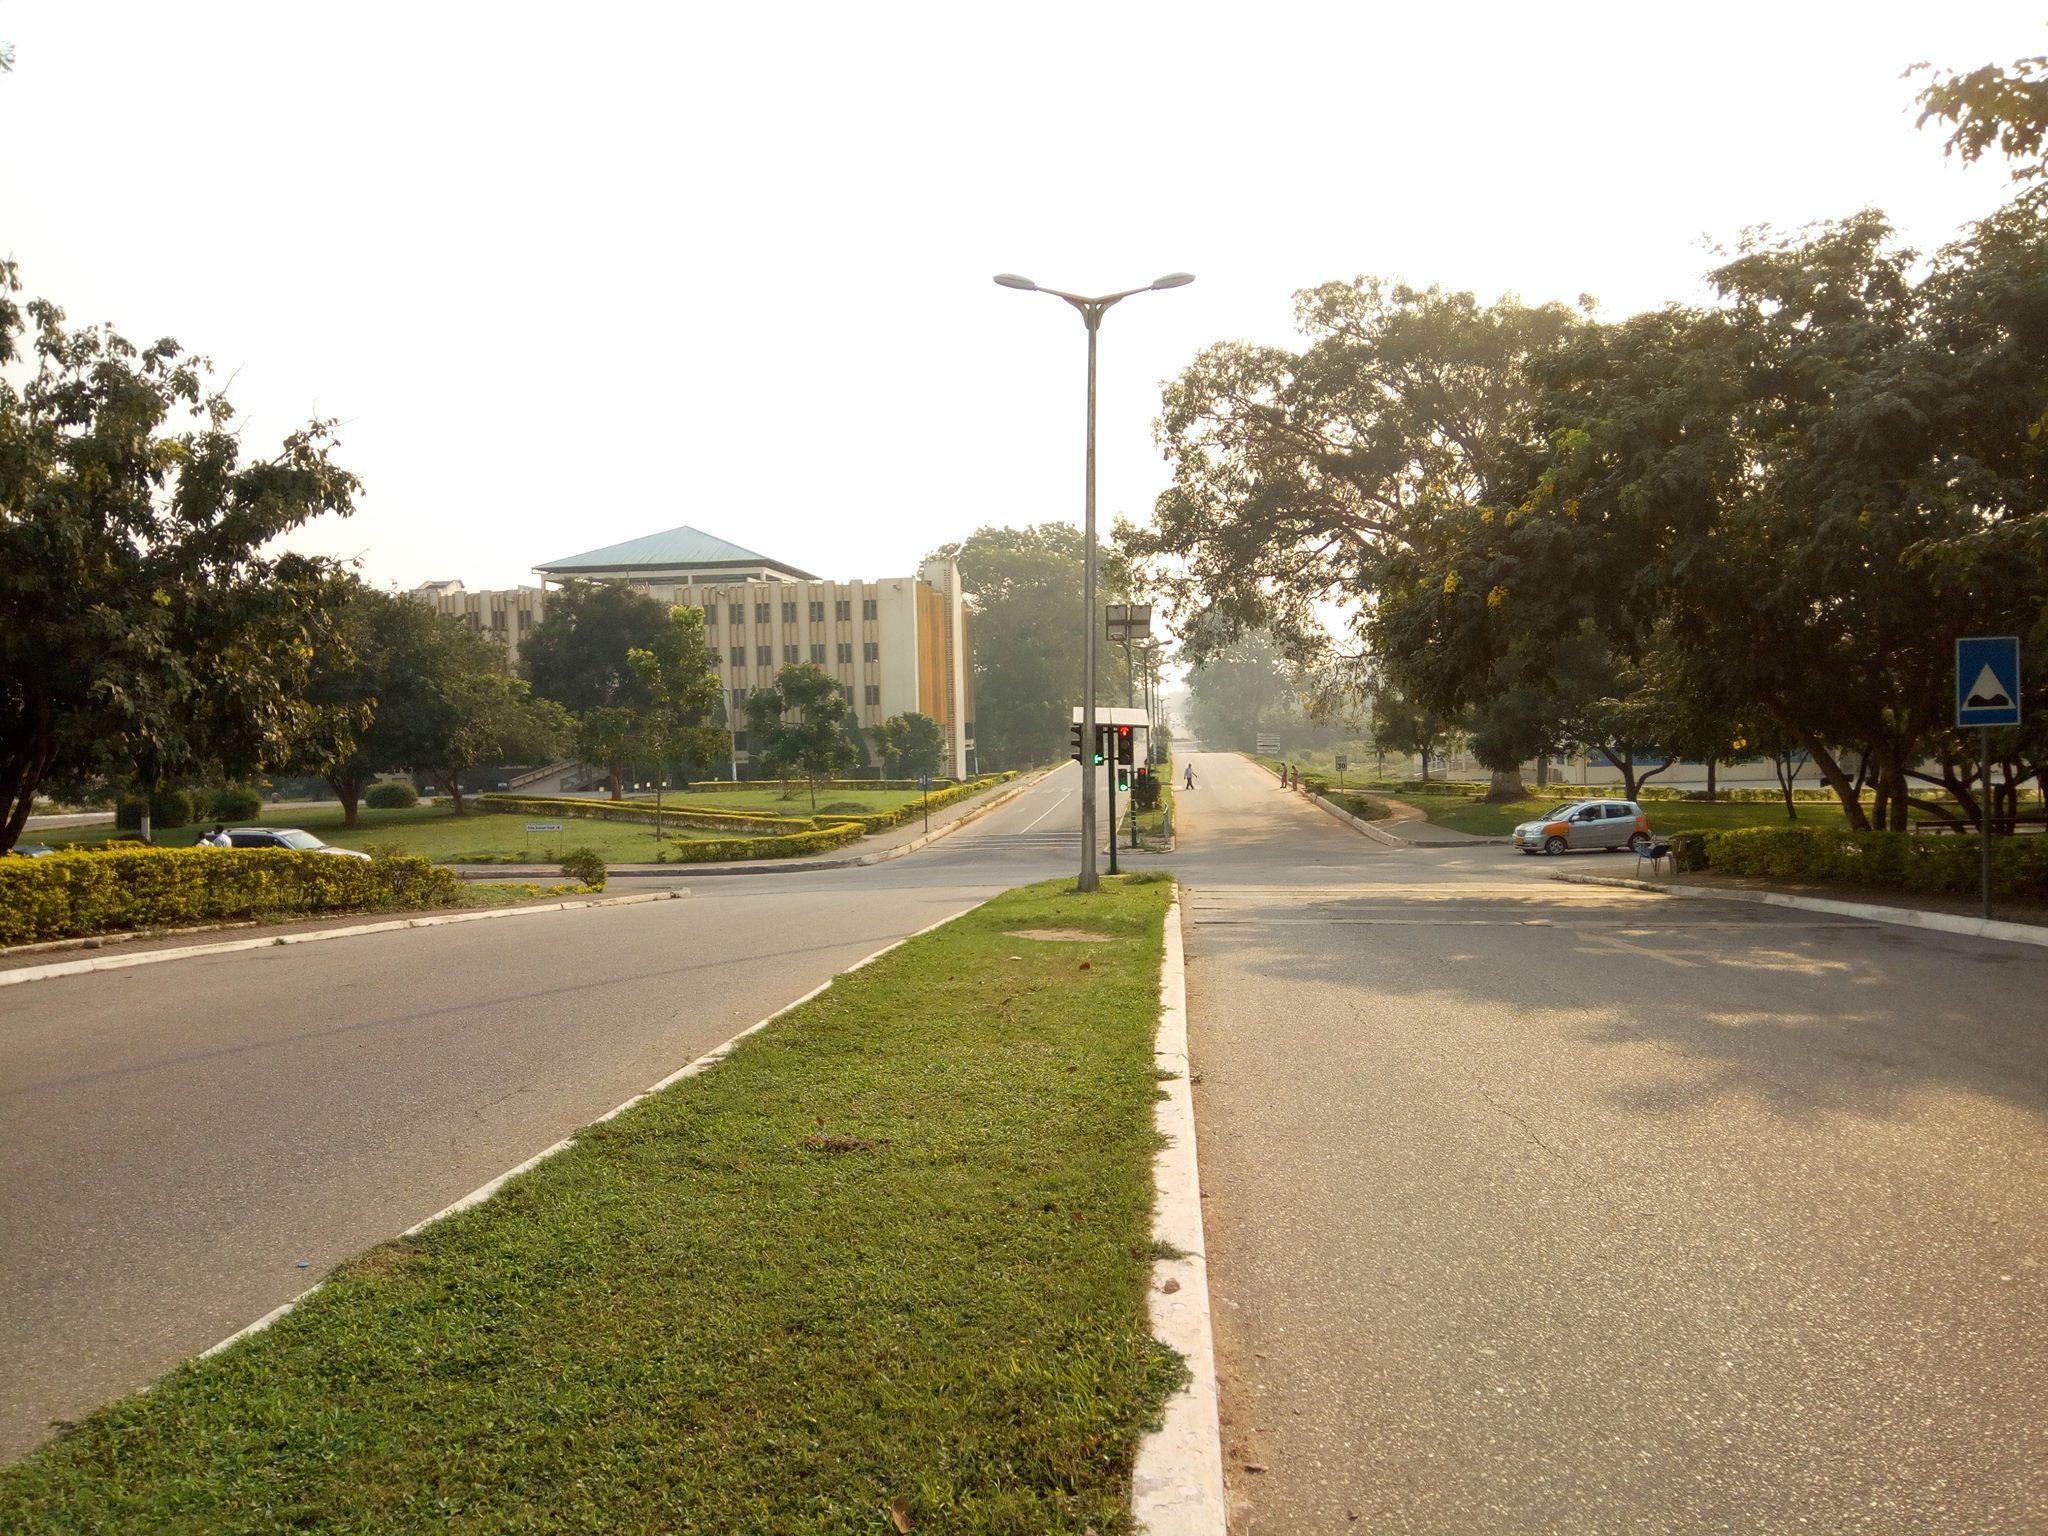 University Of Cape Coast (UCC)